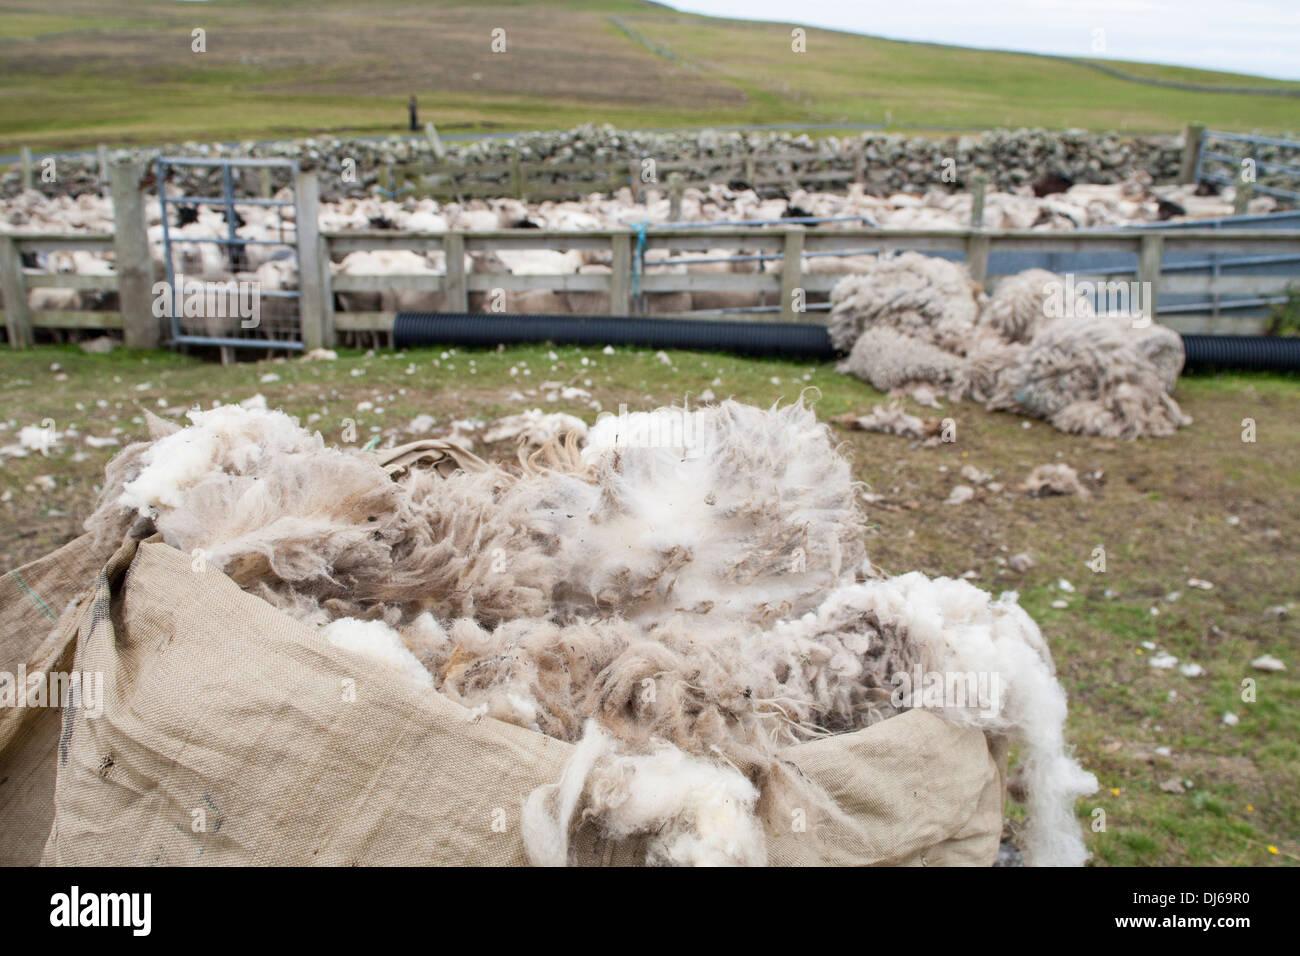 Sack of sheep wool and sheep in holding pen, Fair Isle, Shetland - Stock Image